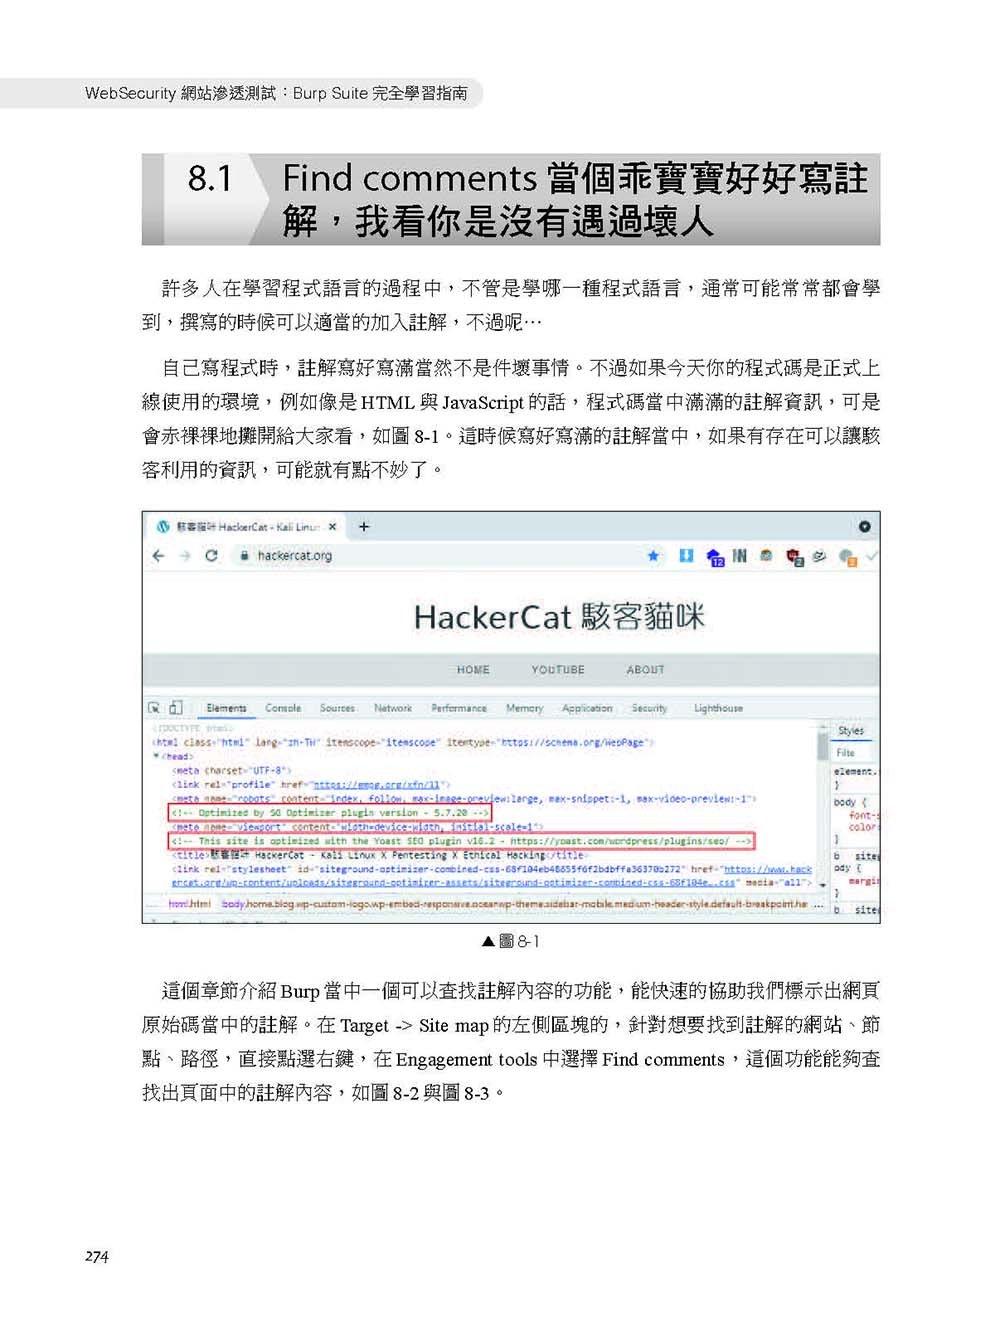 WebSecurity 網站滲透測試:Burp Suite 完全學習指南 (iT邦幫忙鐵人賽系列書)-preview-11